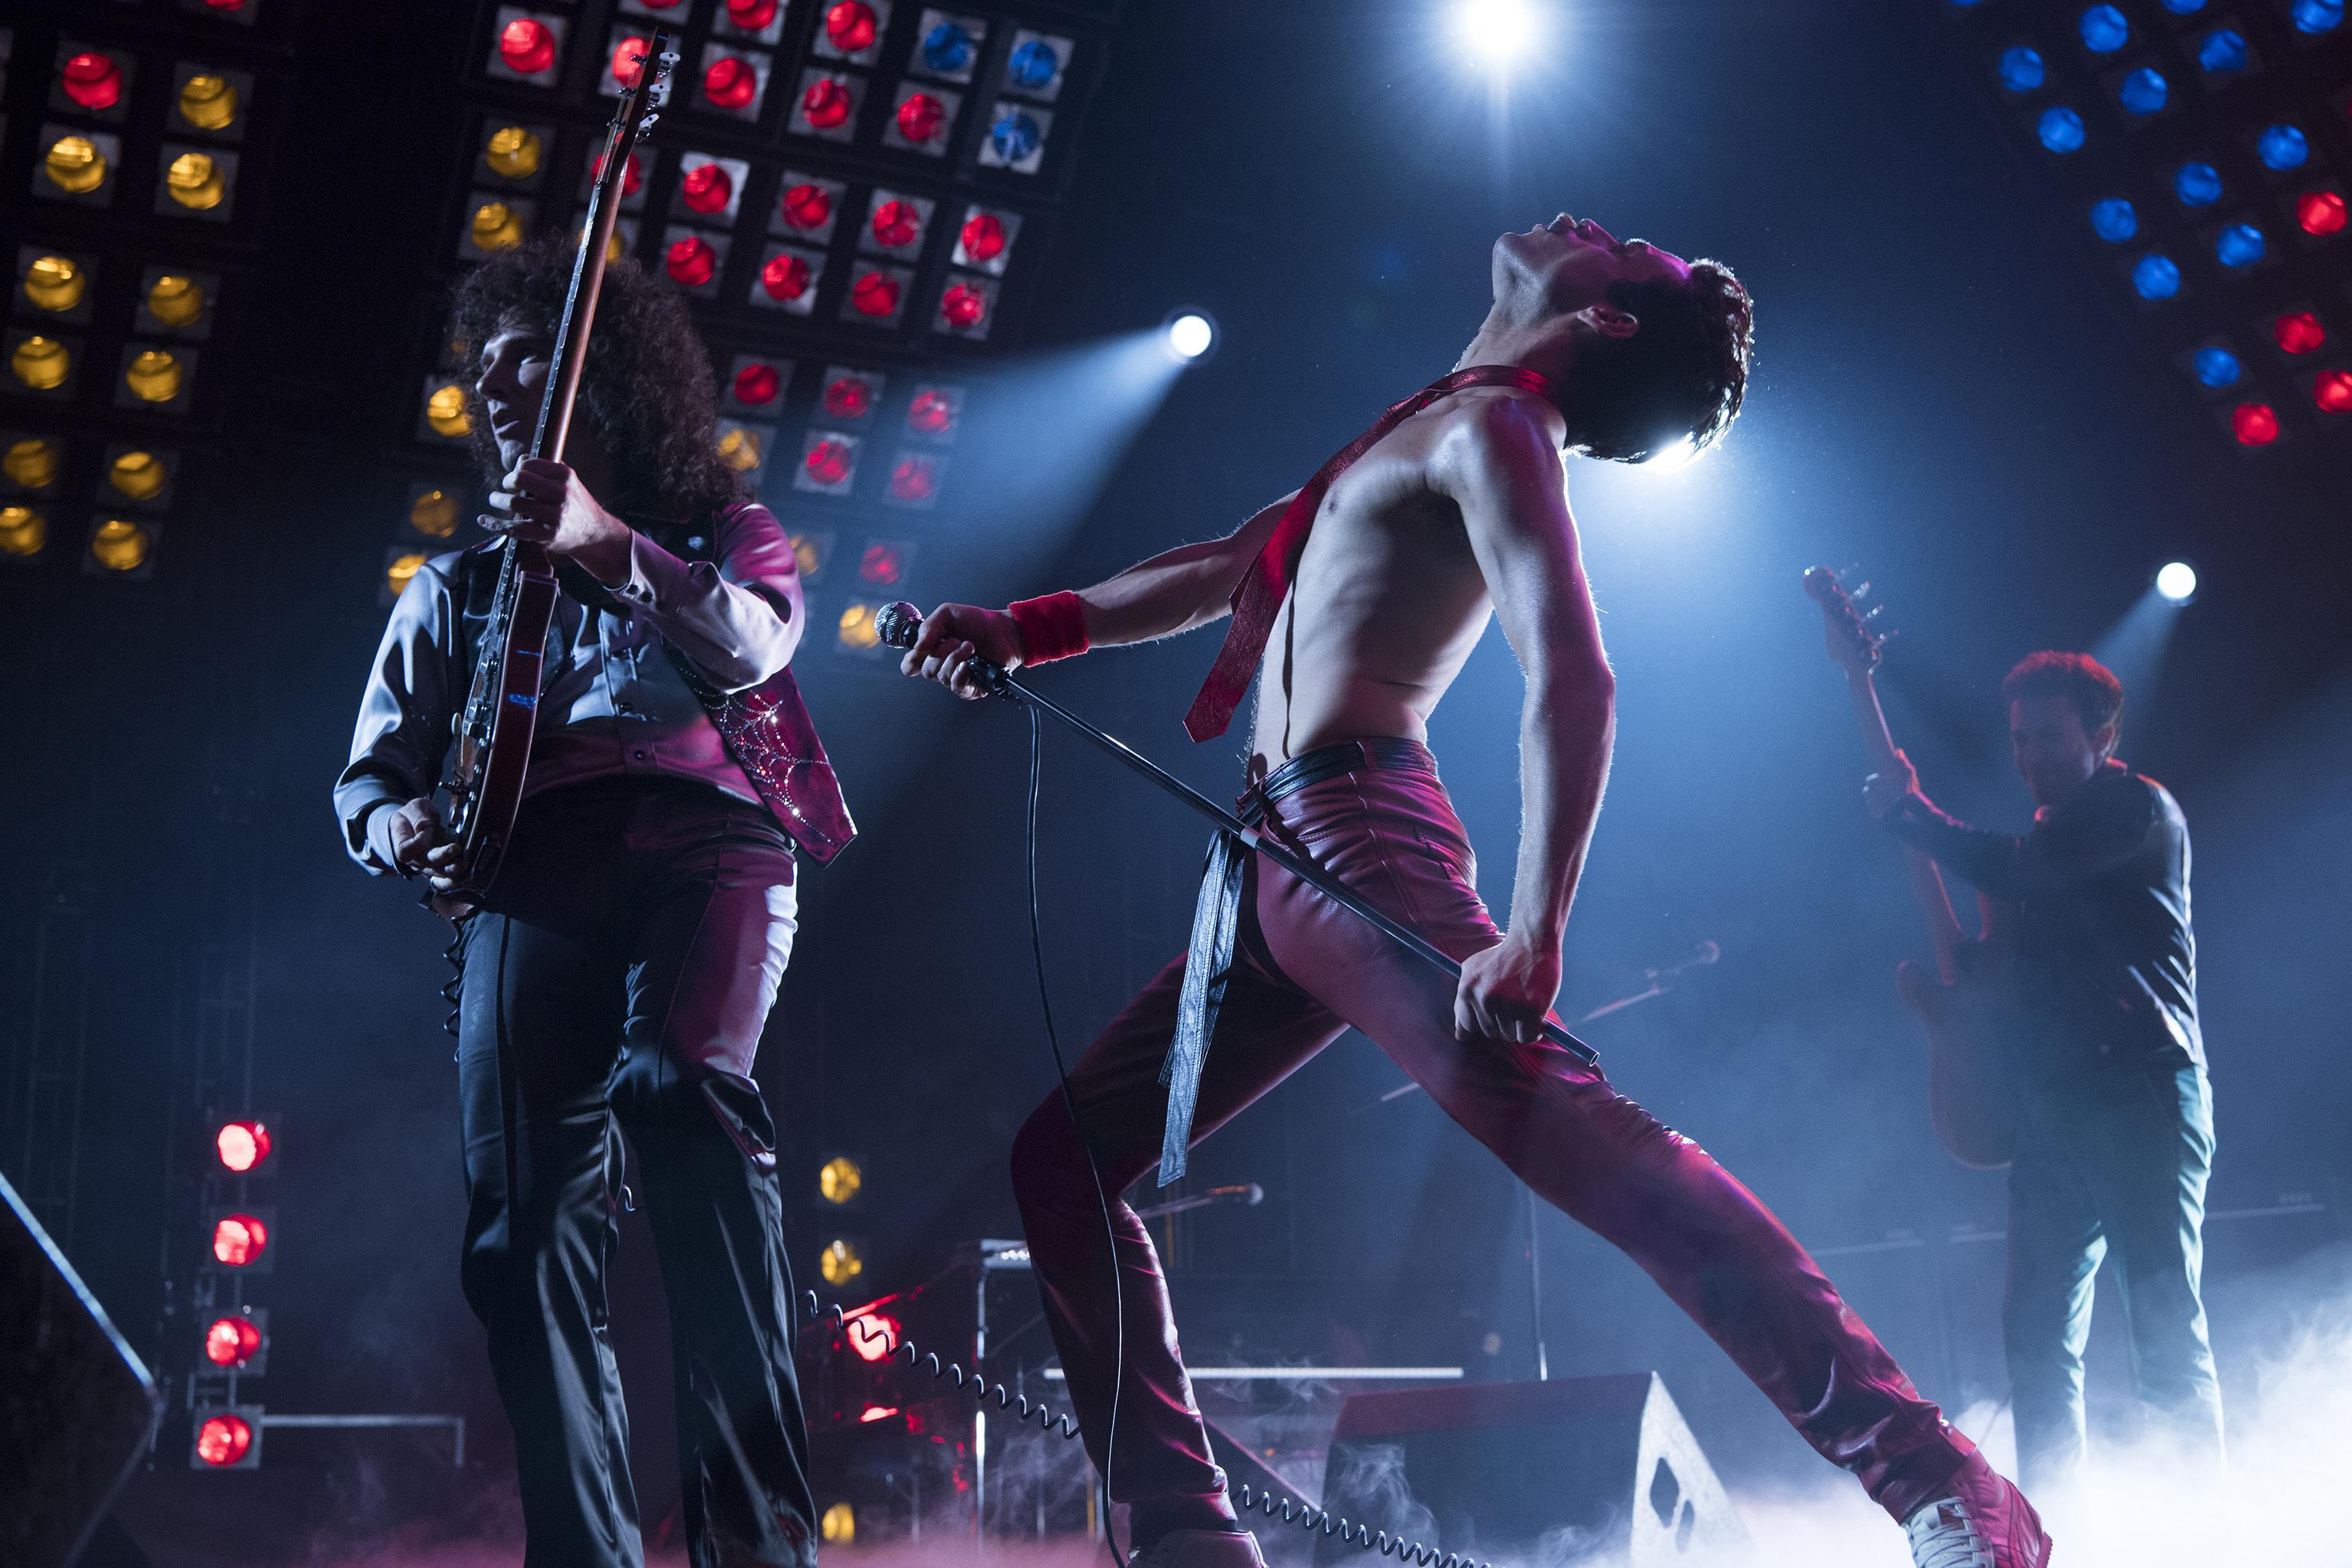 'Bohemian Rhapsody,' 'Rocketman,' 'Yesterday' sell music, defining legacies